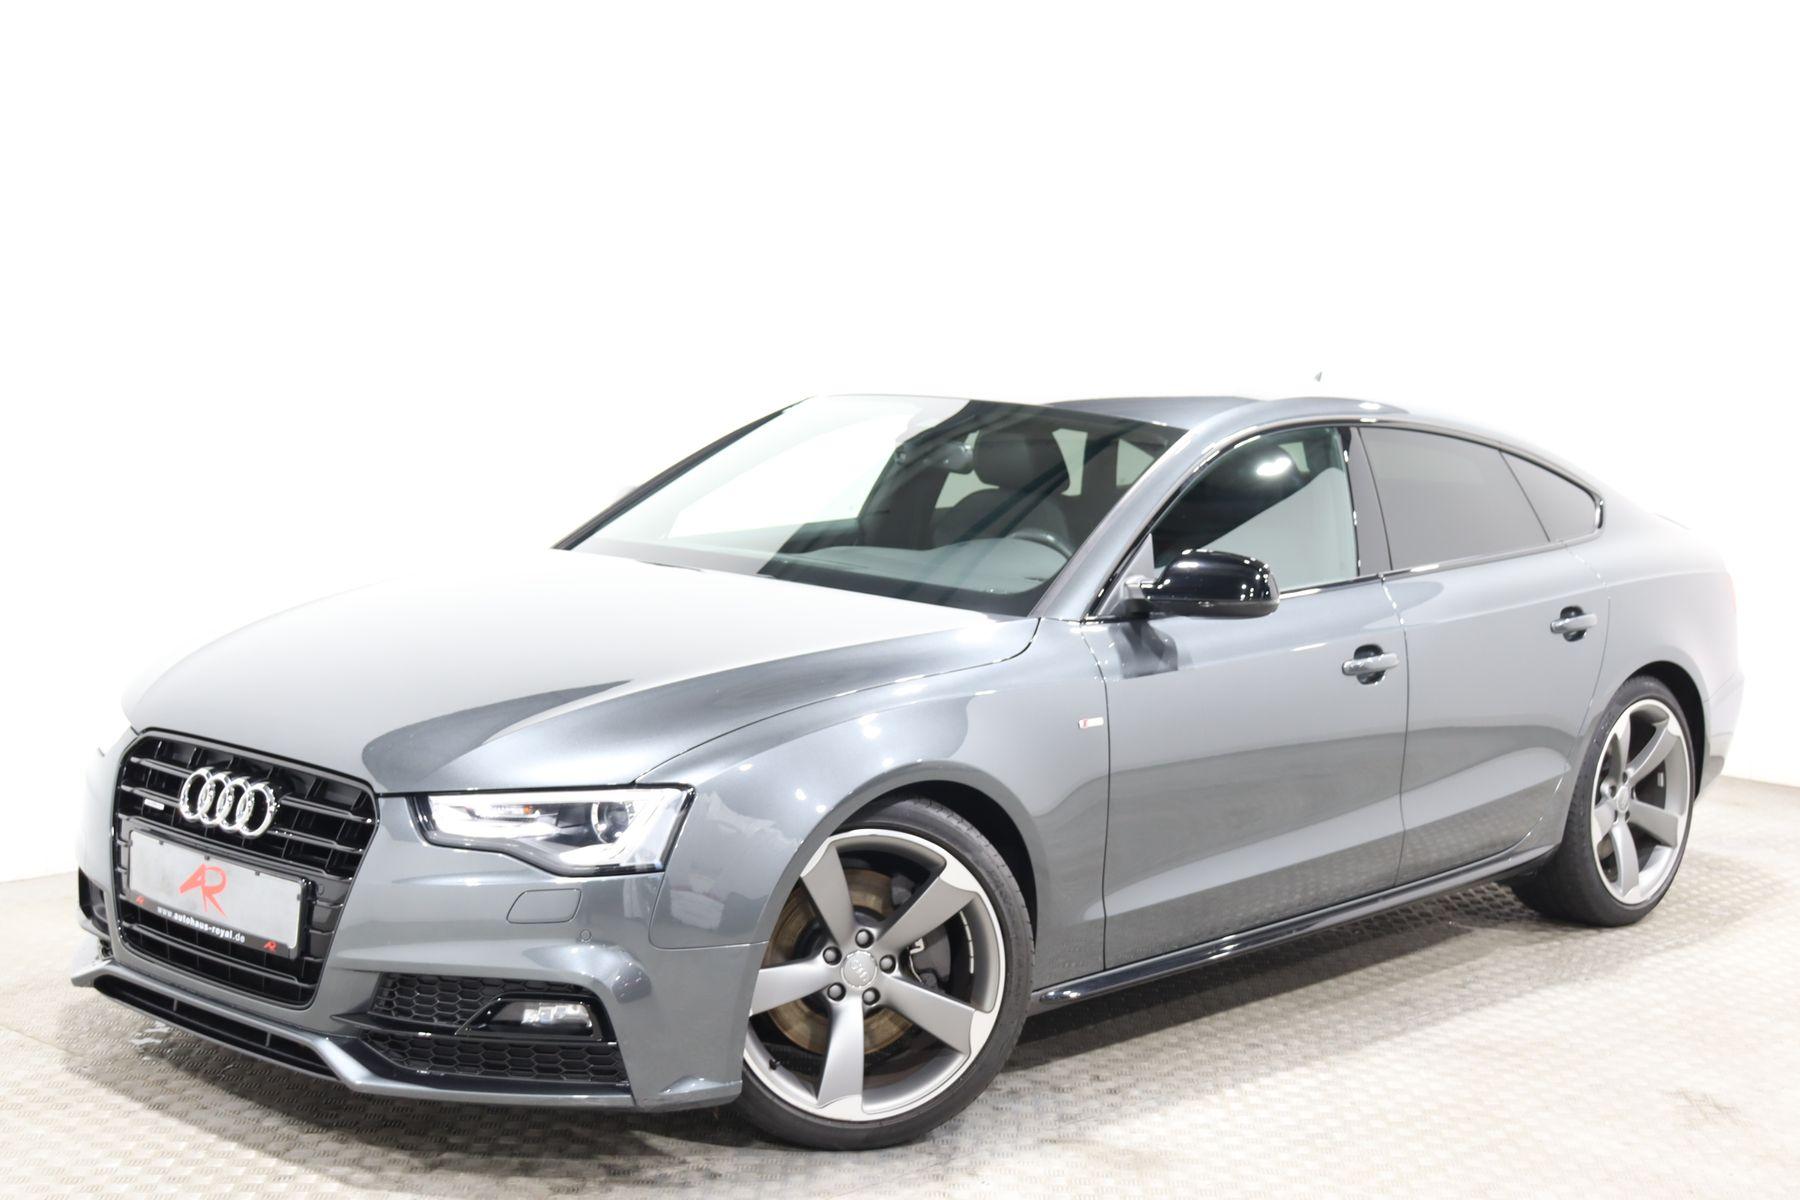 Audi A5 SB 3.0 TFSI qu 3x S LINE BANG+O,ACC,KEYLESS, Jahr 2014, Benzin